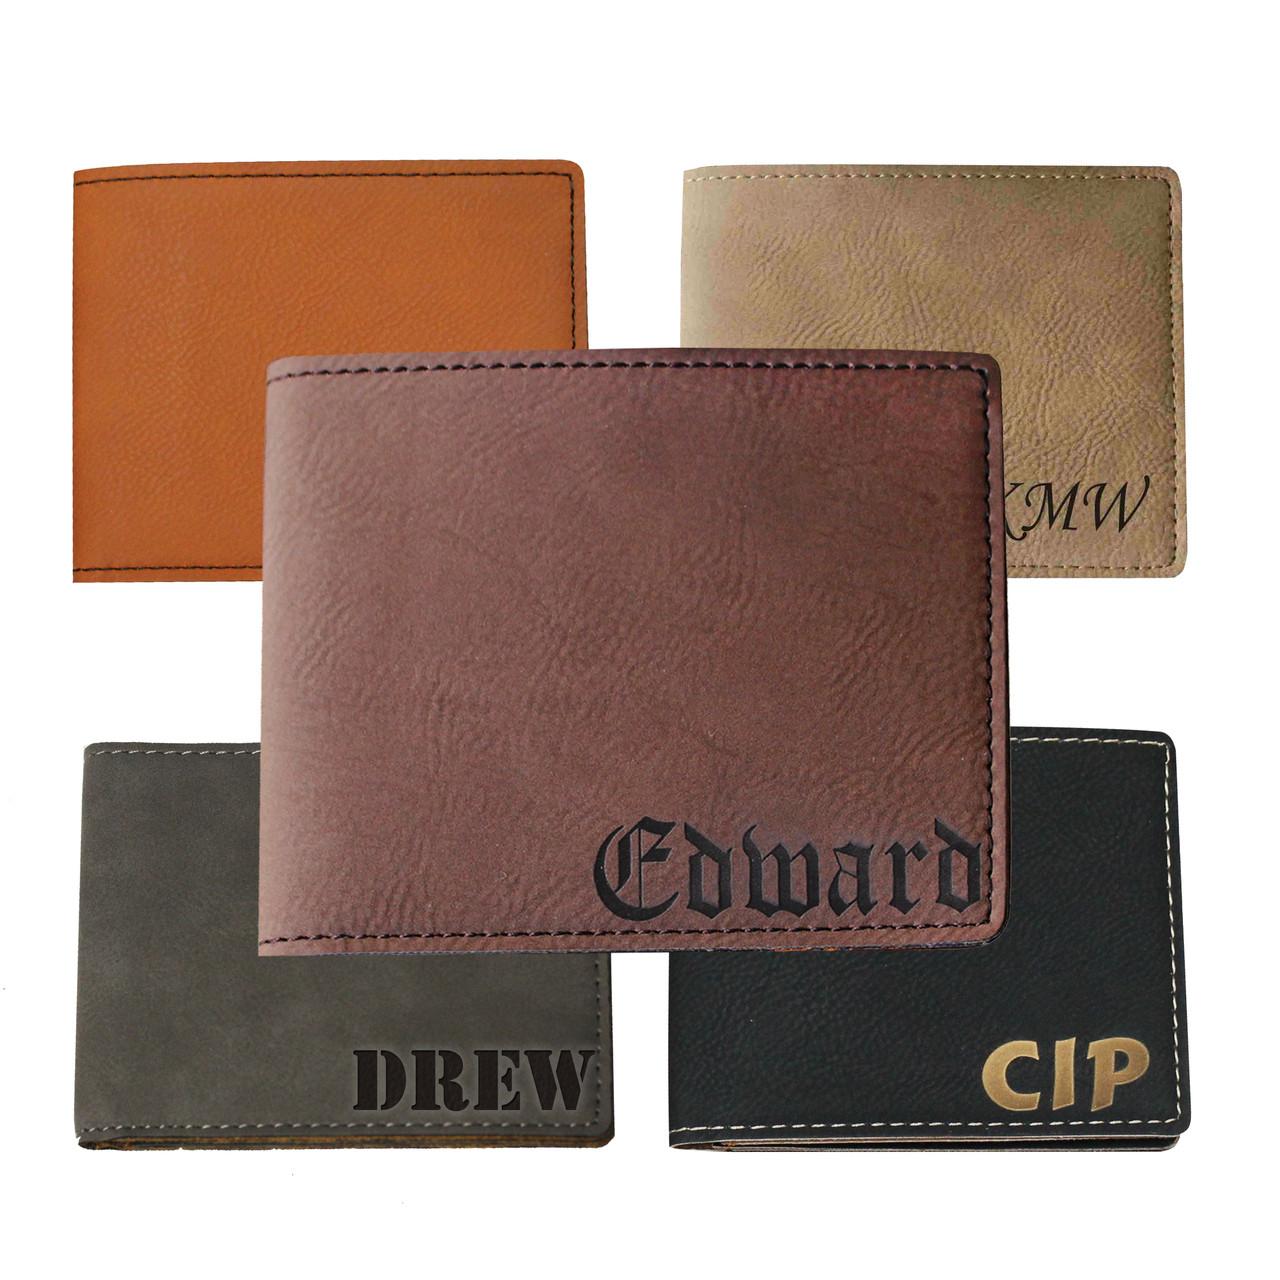 651be6d2856 ... Engraved Leather Bi-Fold Wallet. Image 1. Loading zoom